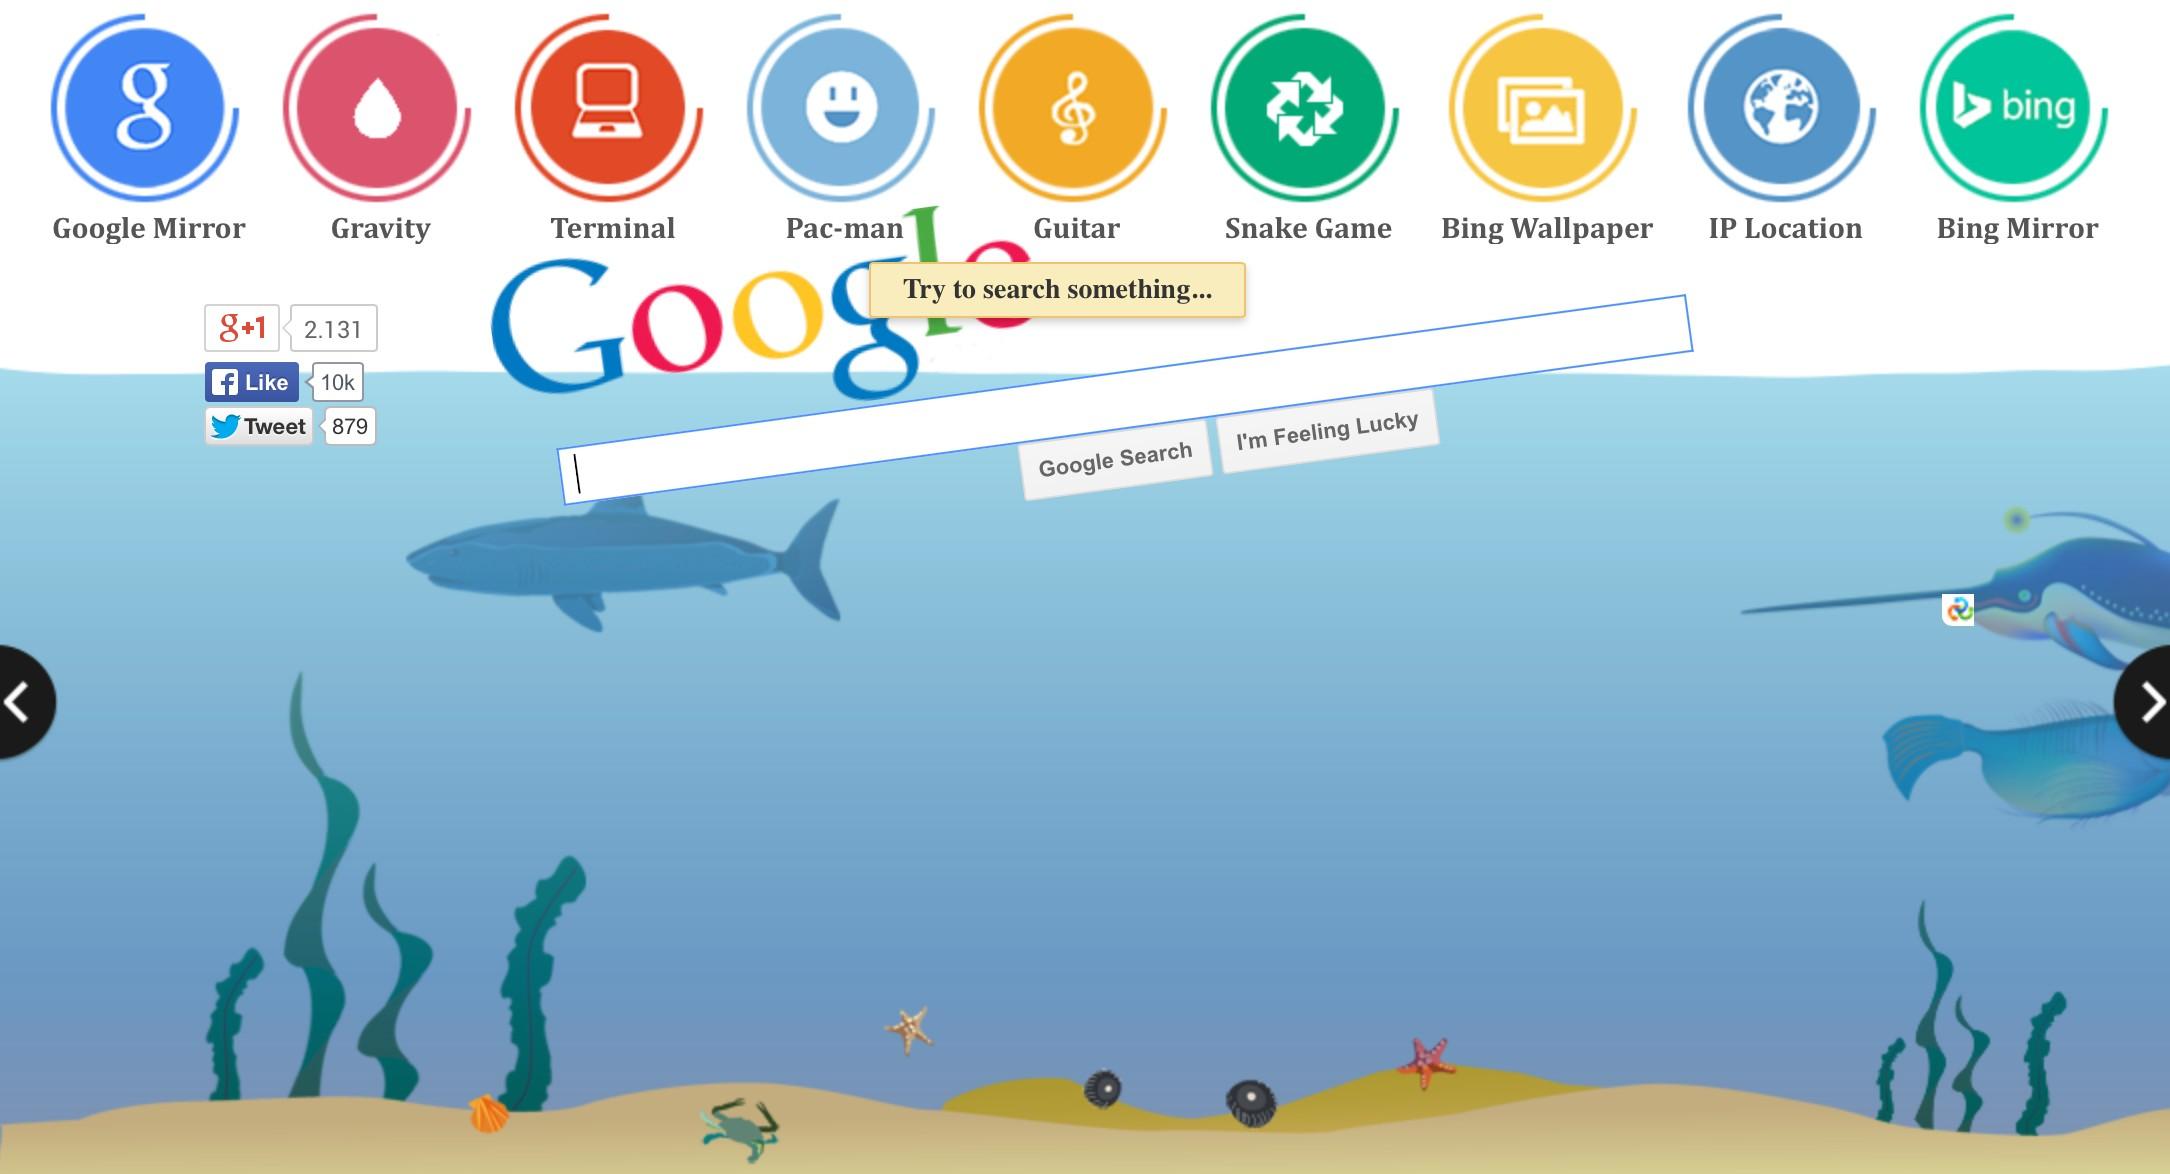 tinh nang thu vi google